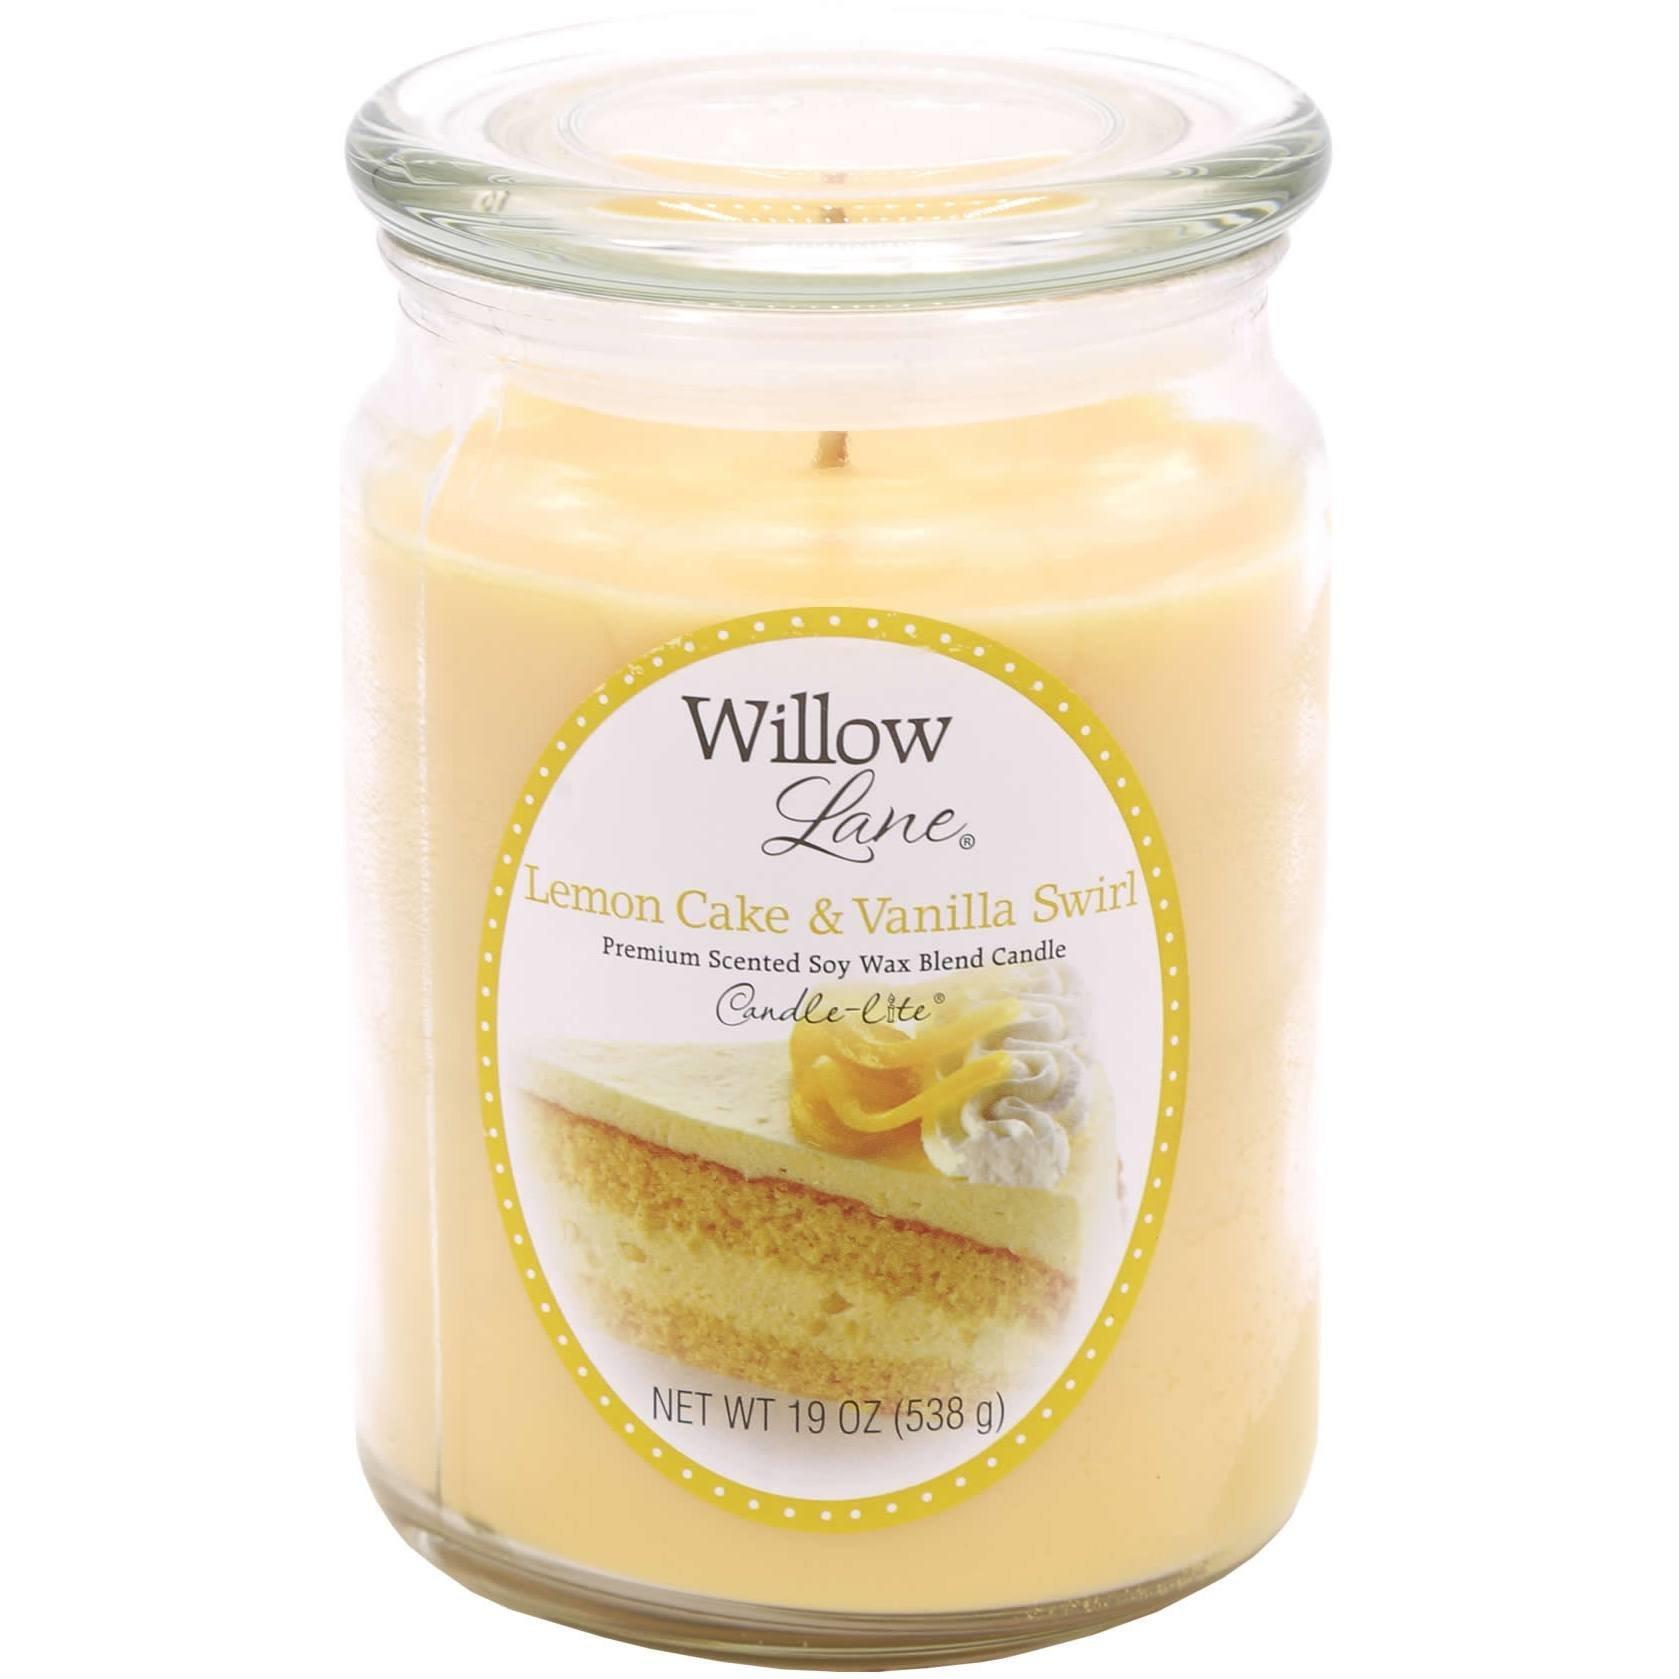 Candle-lite kvapioji žvakė Willow Lemon Cake & Vanilla Swirl